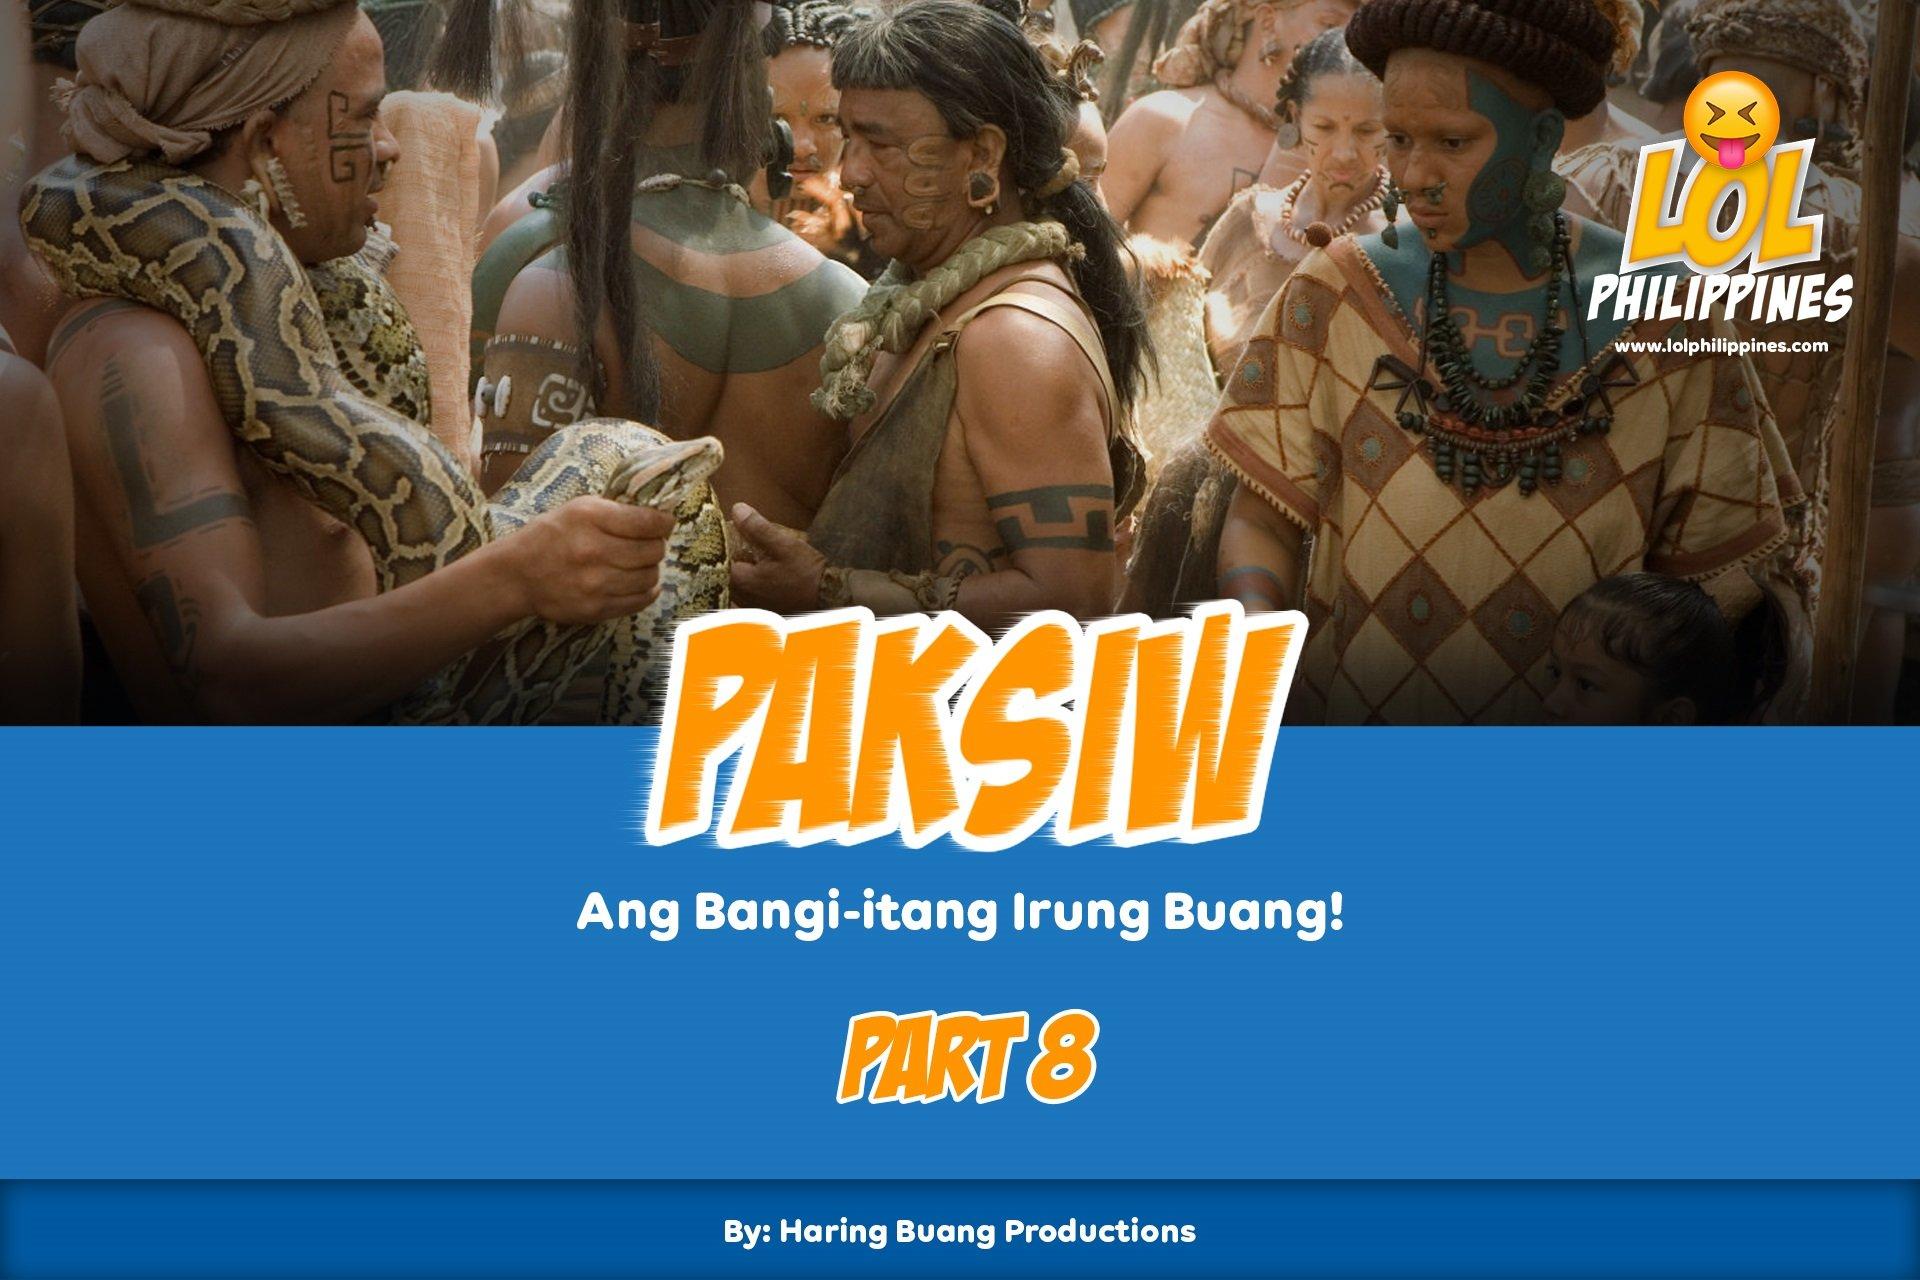 LOL Philippines Paksiw Part 8